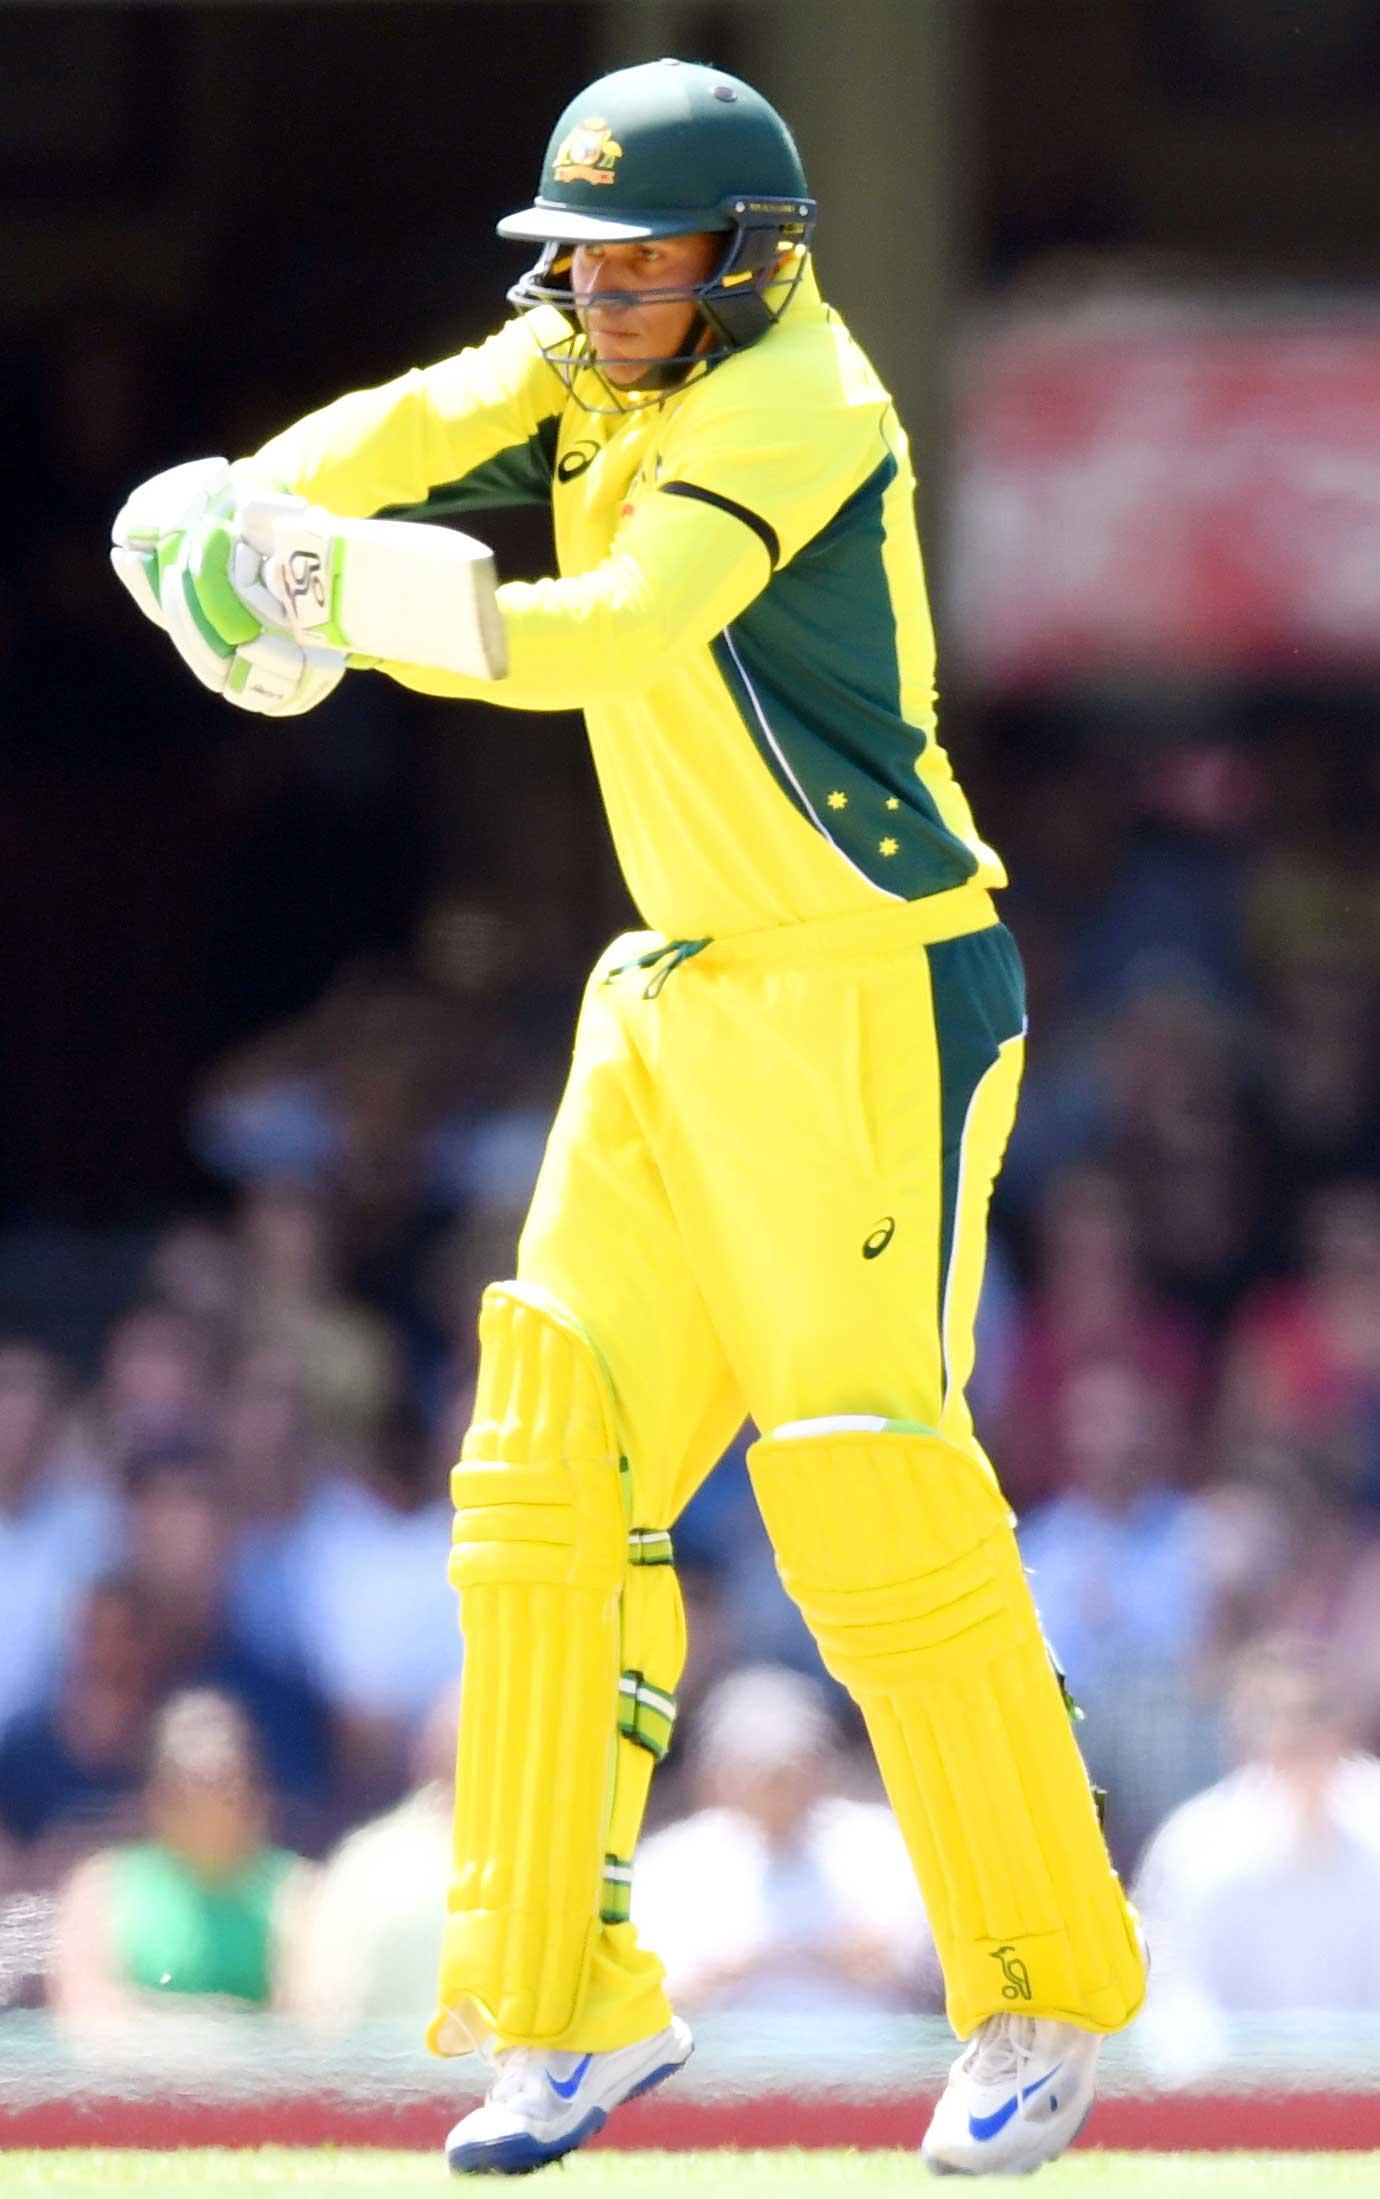 Usman Khawaja of Australia hits a shot